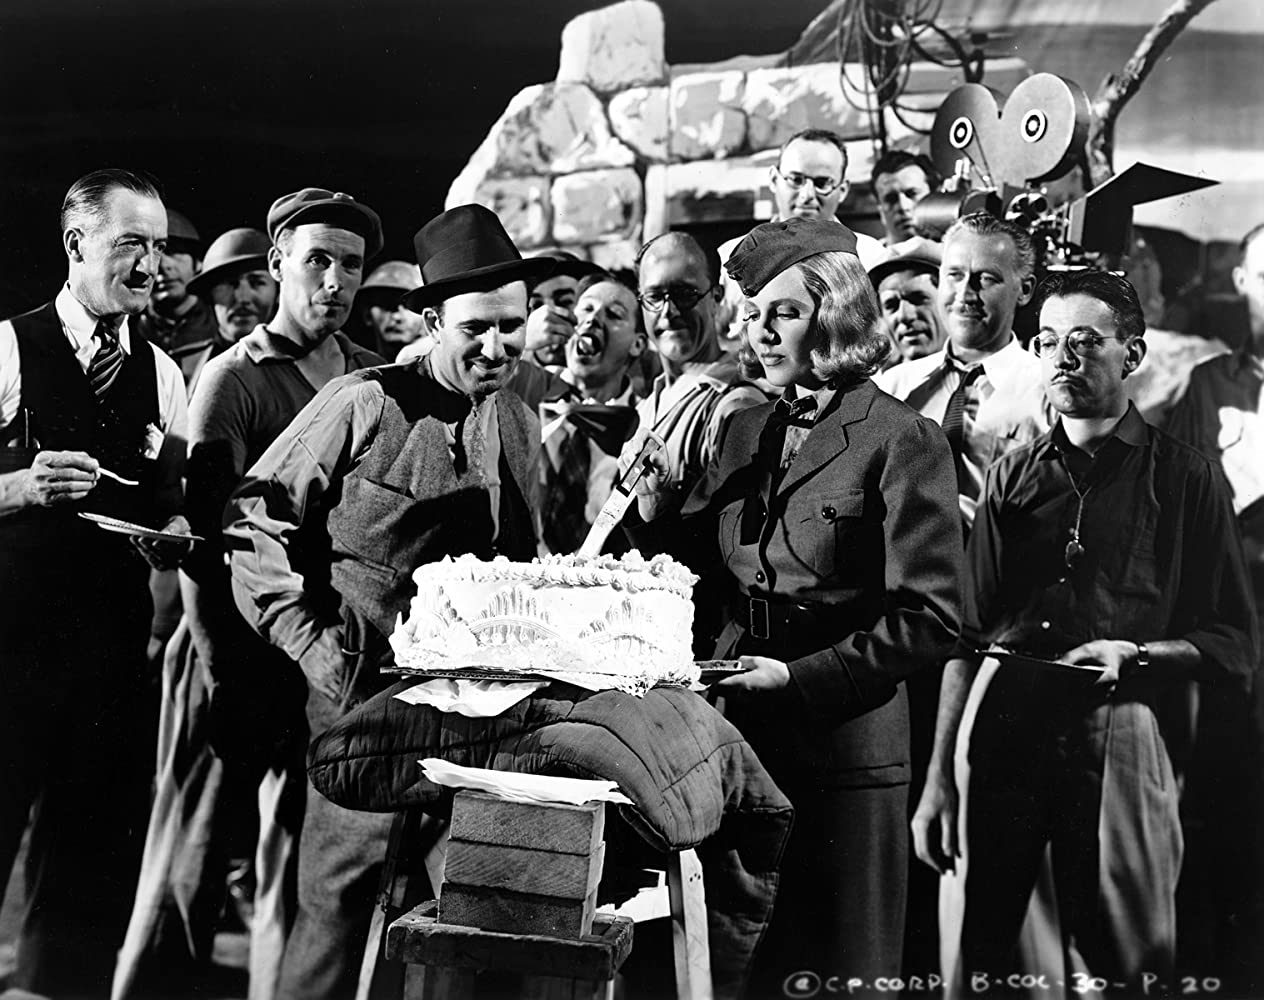 Jean Arthur, Sidney Buchman, Joseph Krumgold, Edward Ludwig, and Harry Sauber in Adventure in Manhattan (1936)